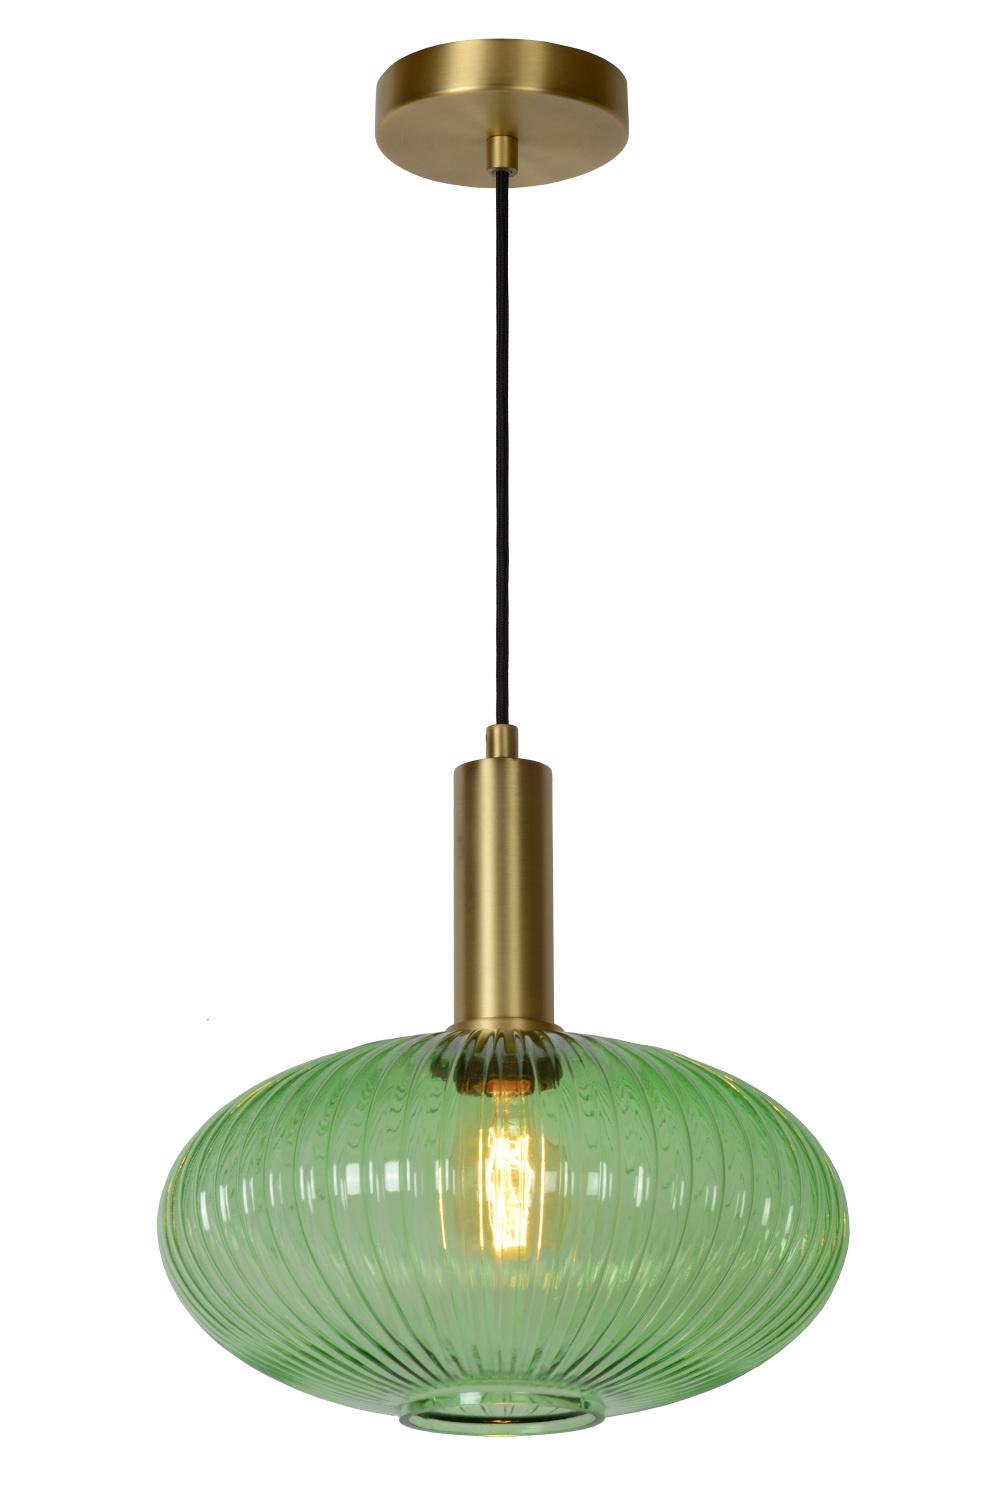 Lucide MALOTO Hanglamp-Groen-Ø30-1xE27-40W-Glas